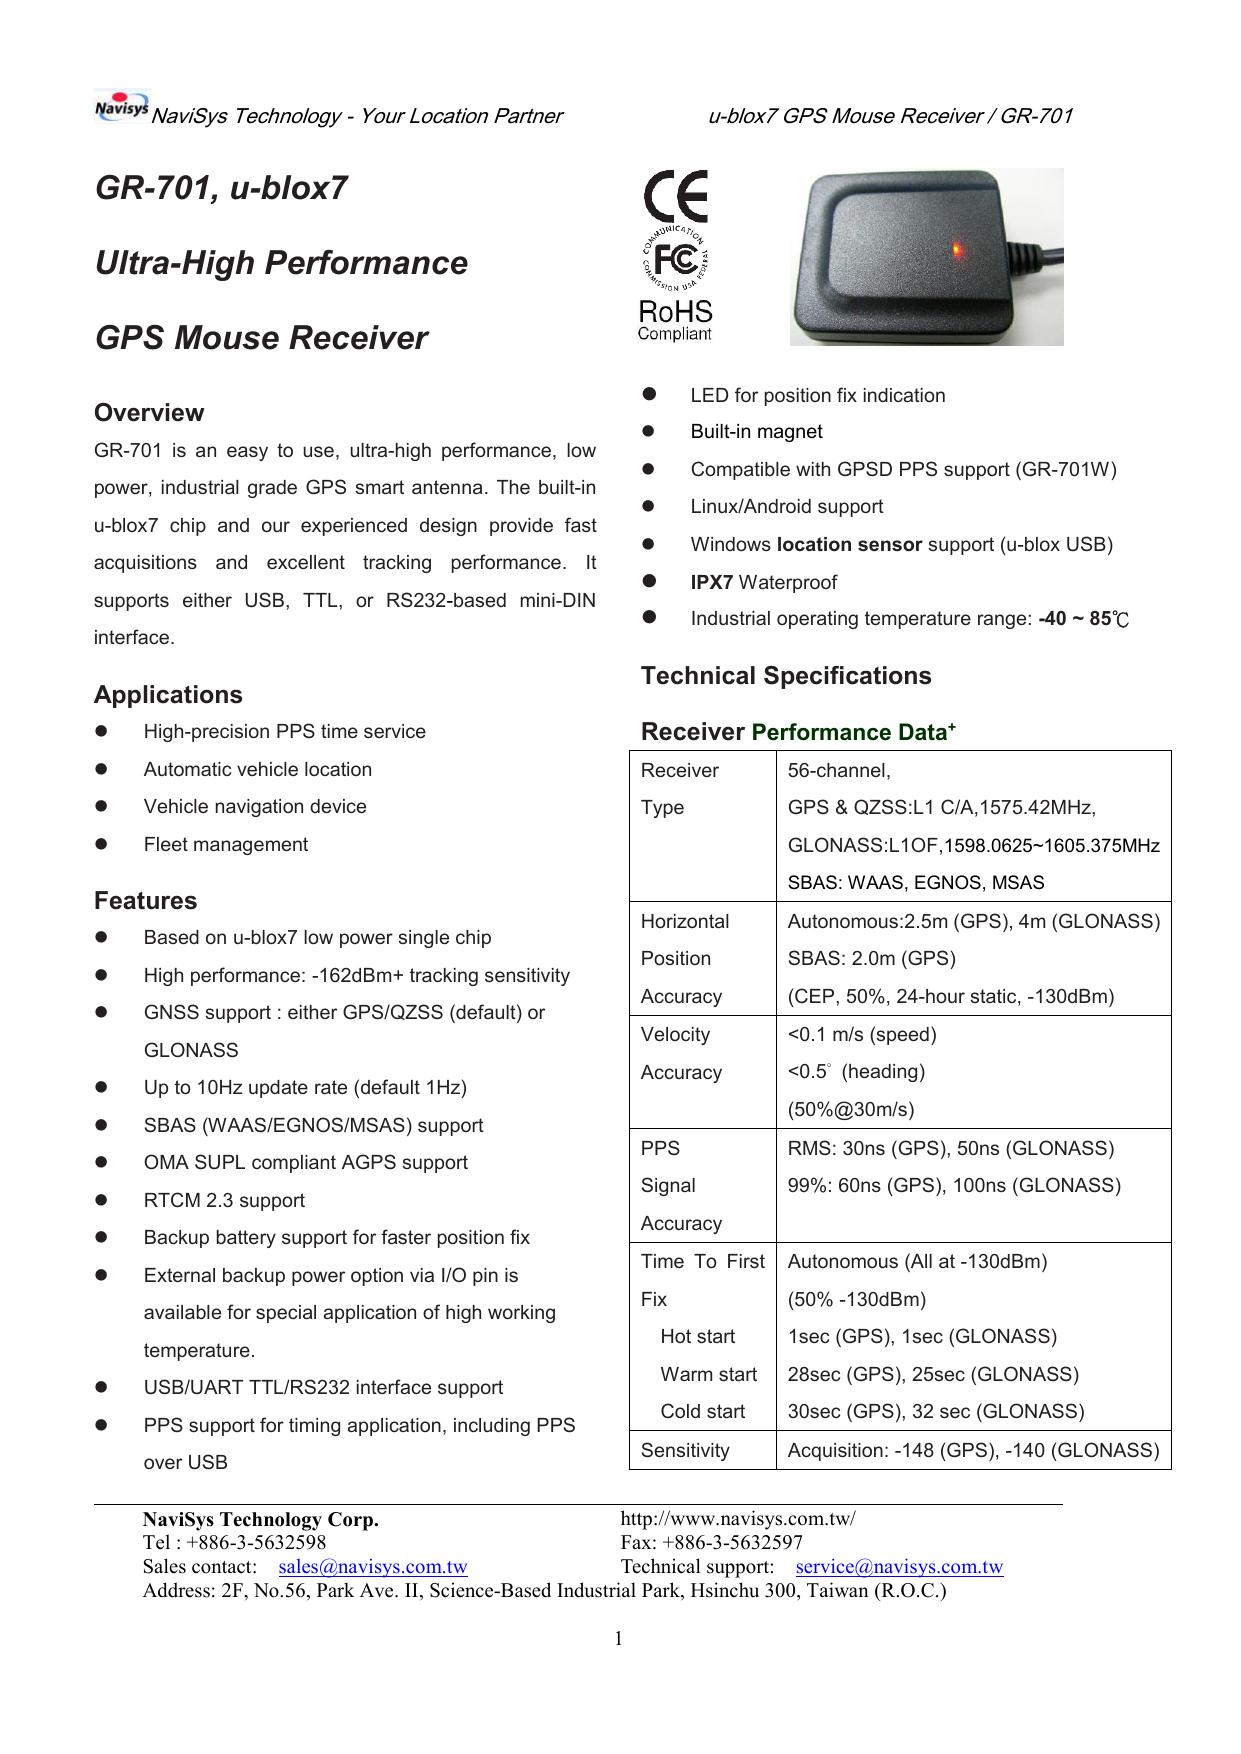 GR-701, u-blox7 Ultra-High Performance GPS   manualzz com